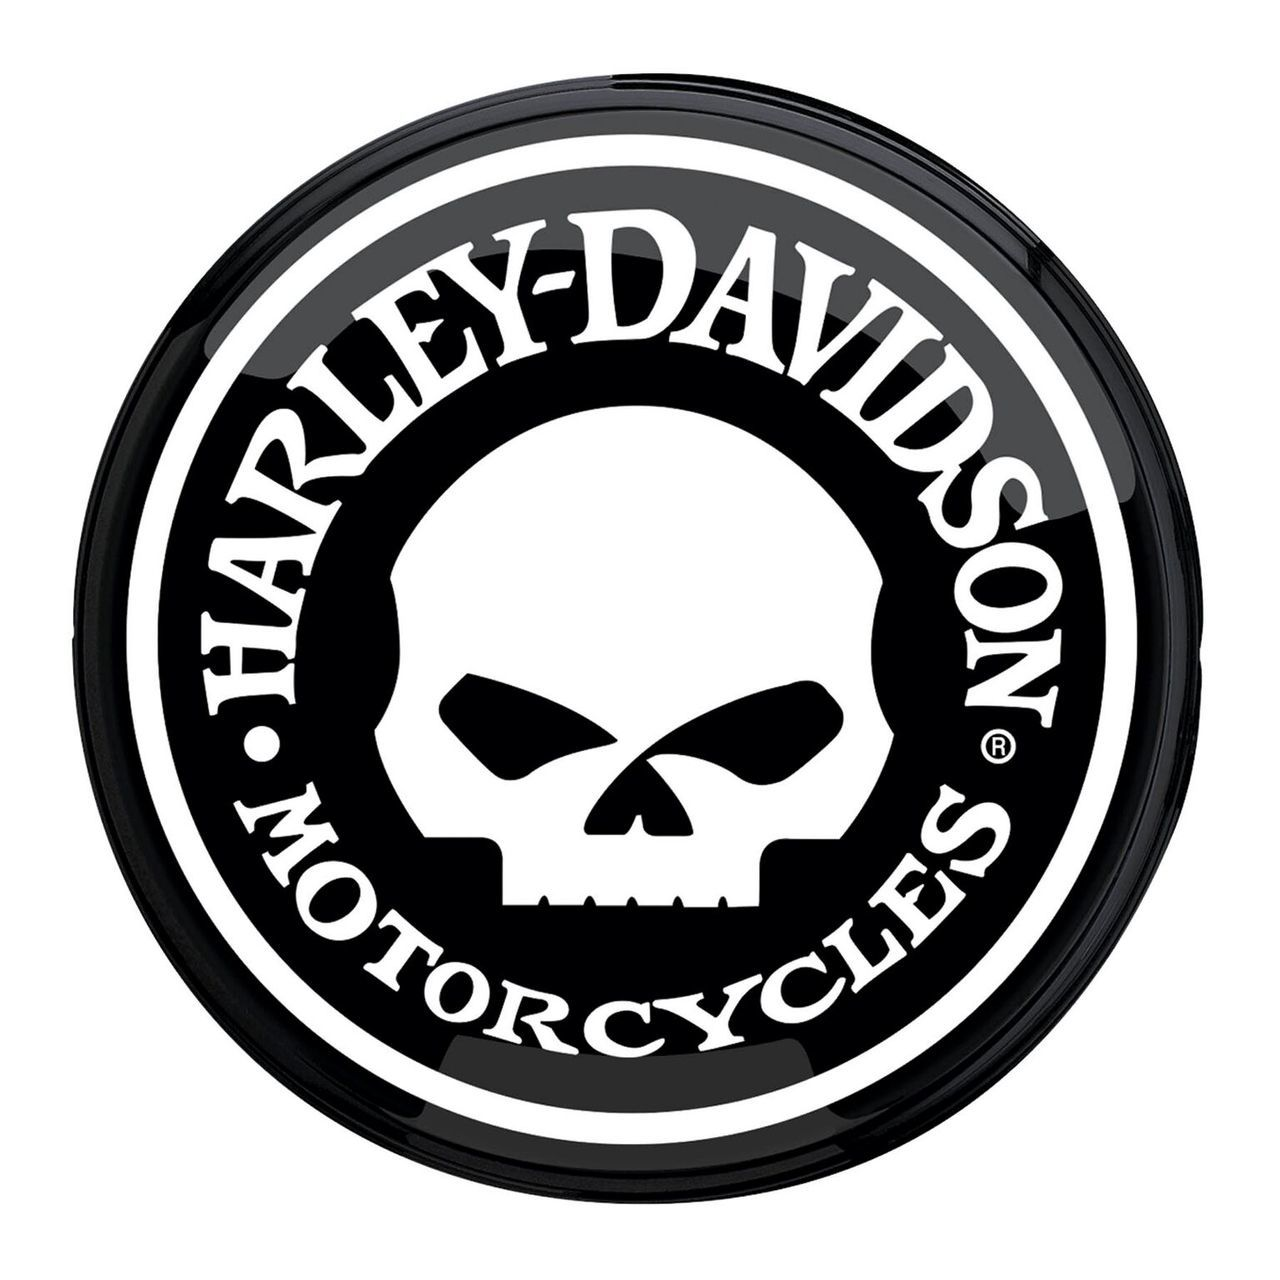 Harley Davidson Wall Pub Light.